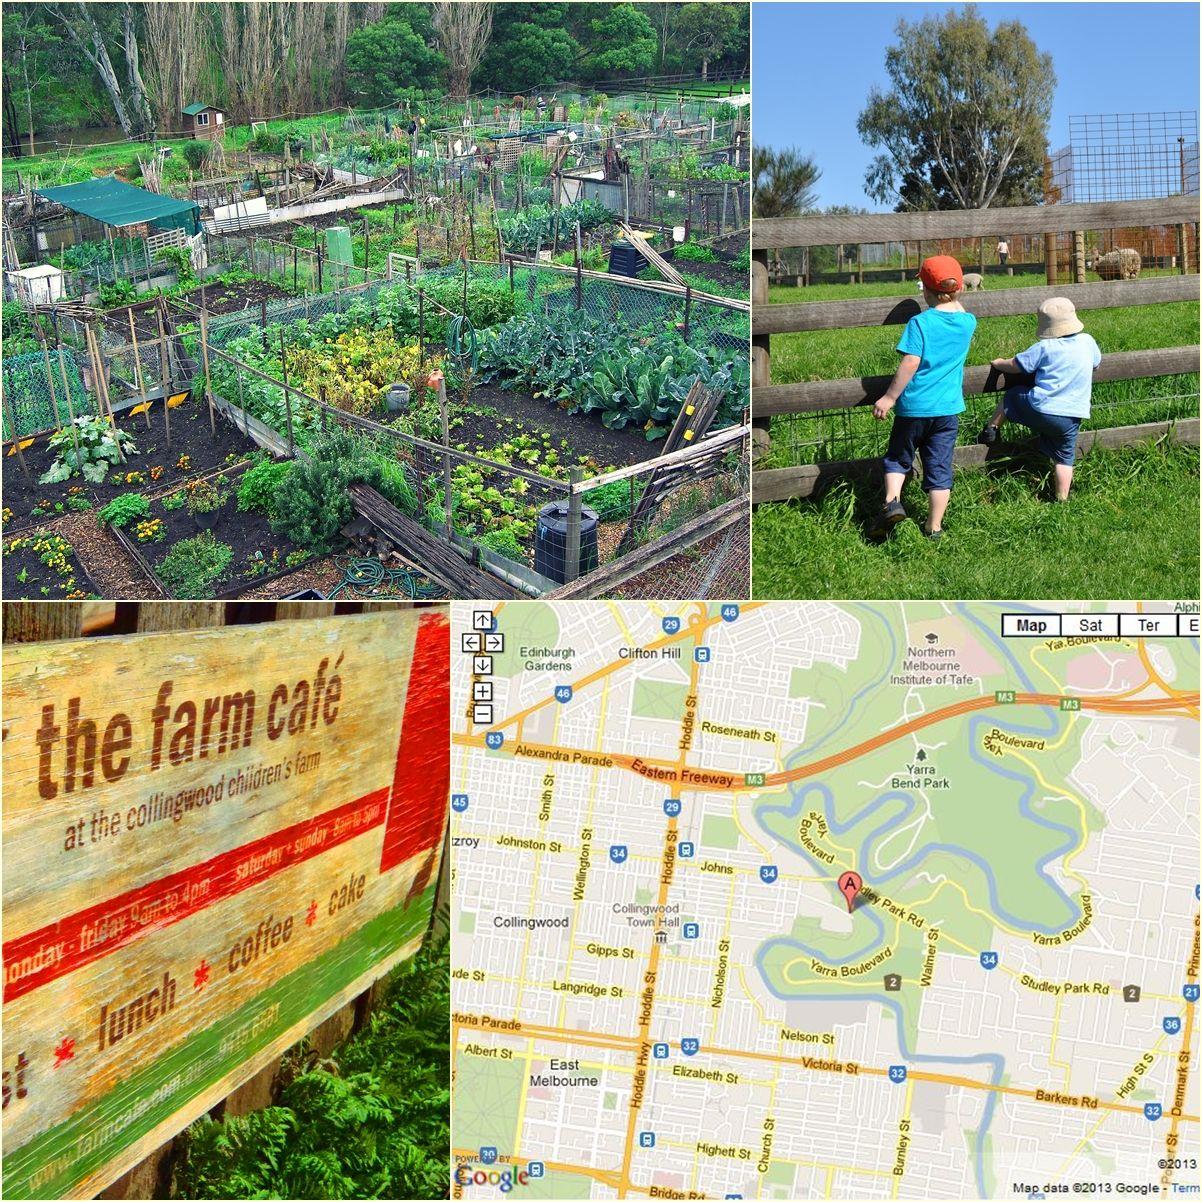 Urban Growth: Melbournes Community Gardens - The Photo ...